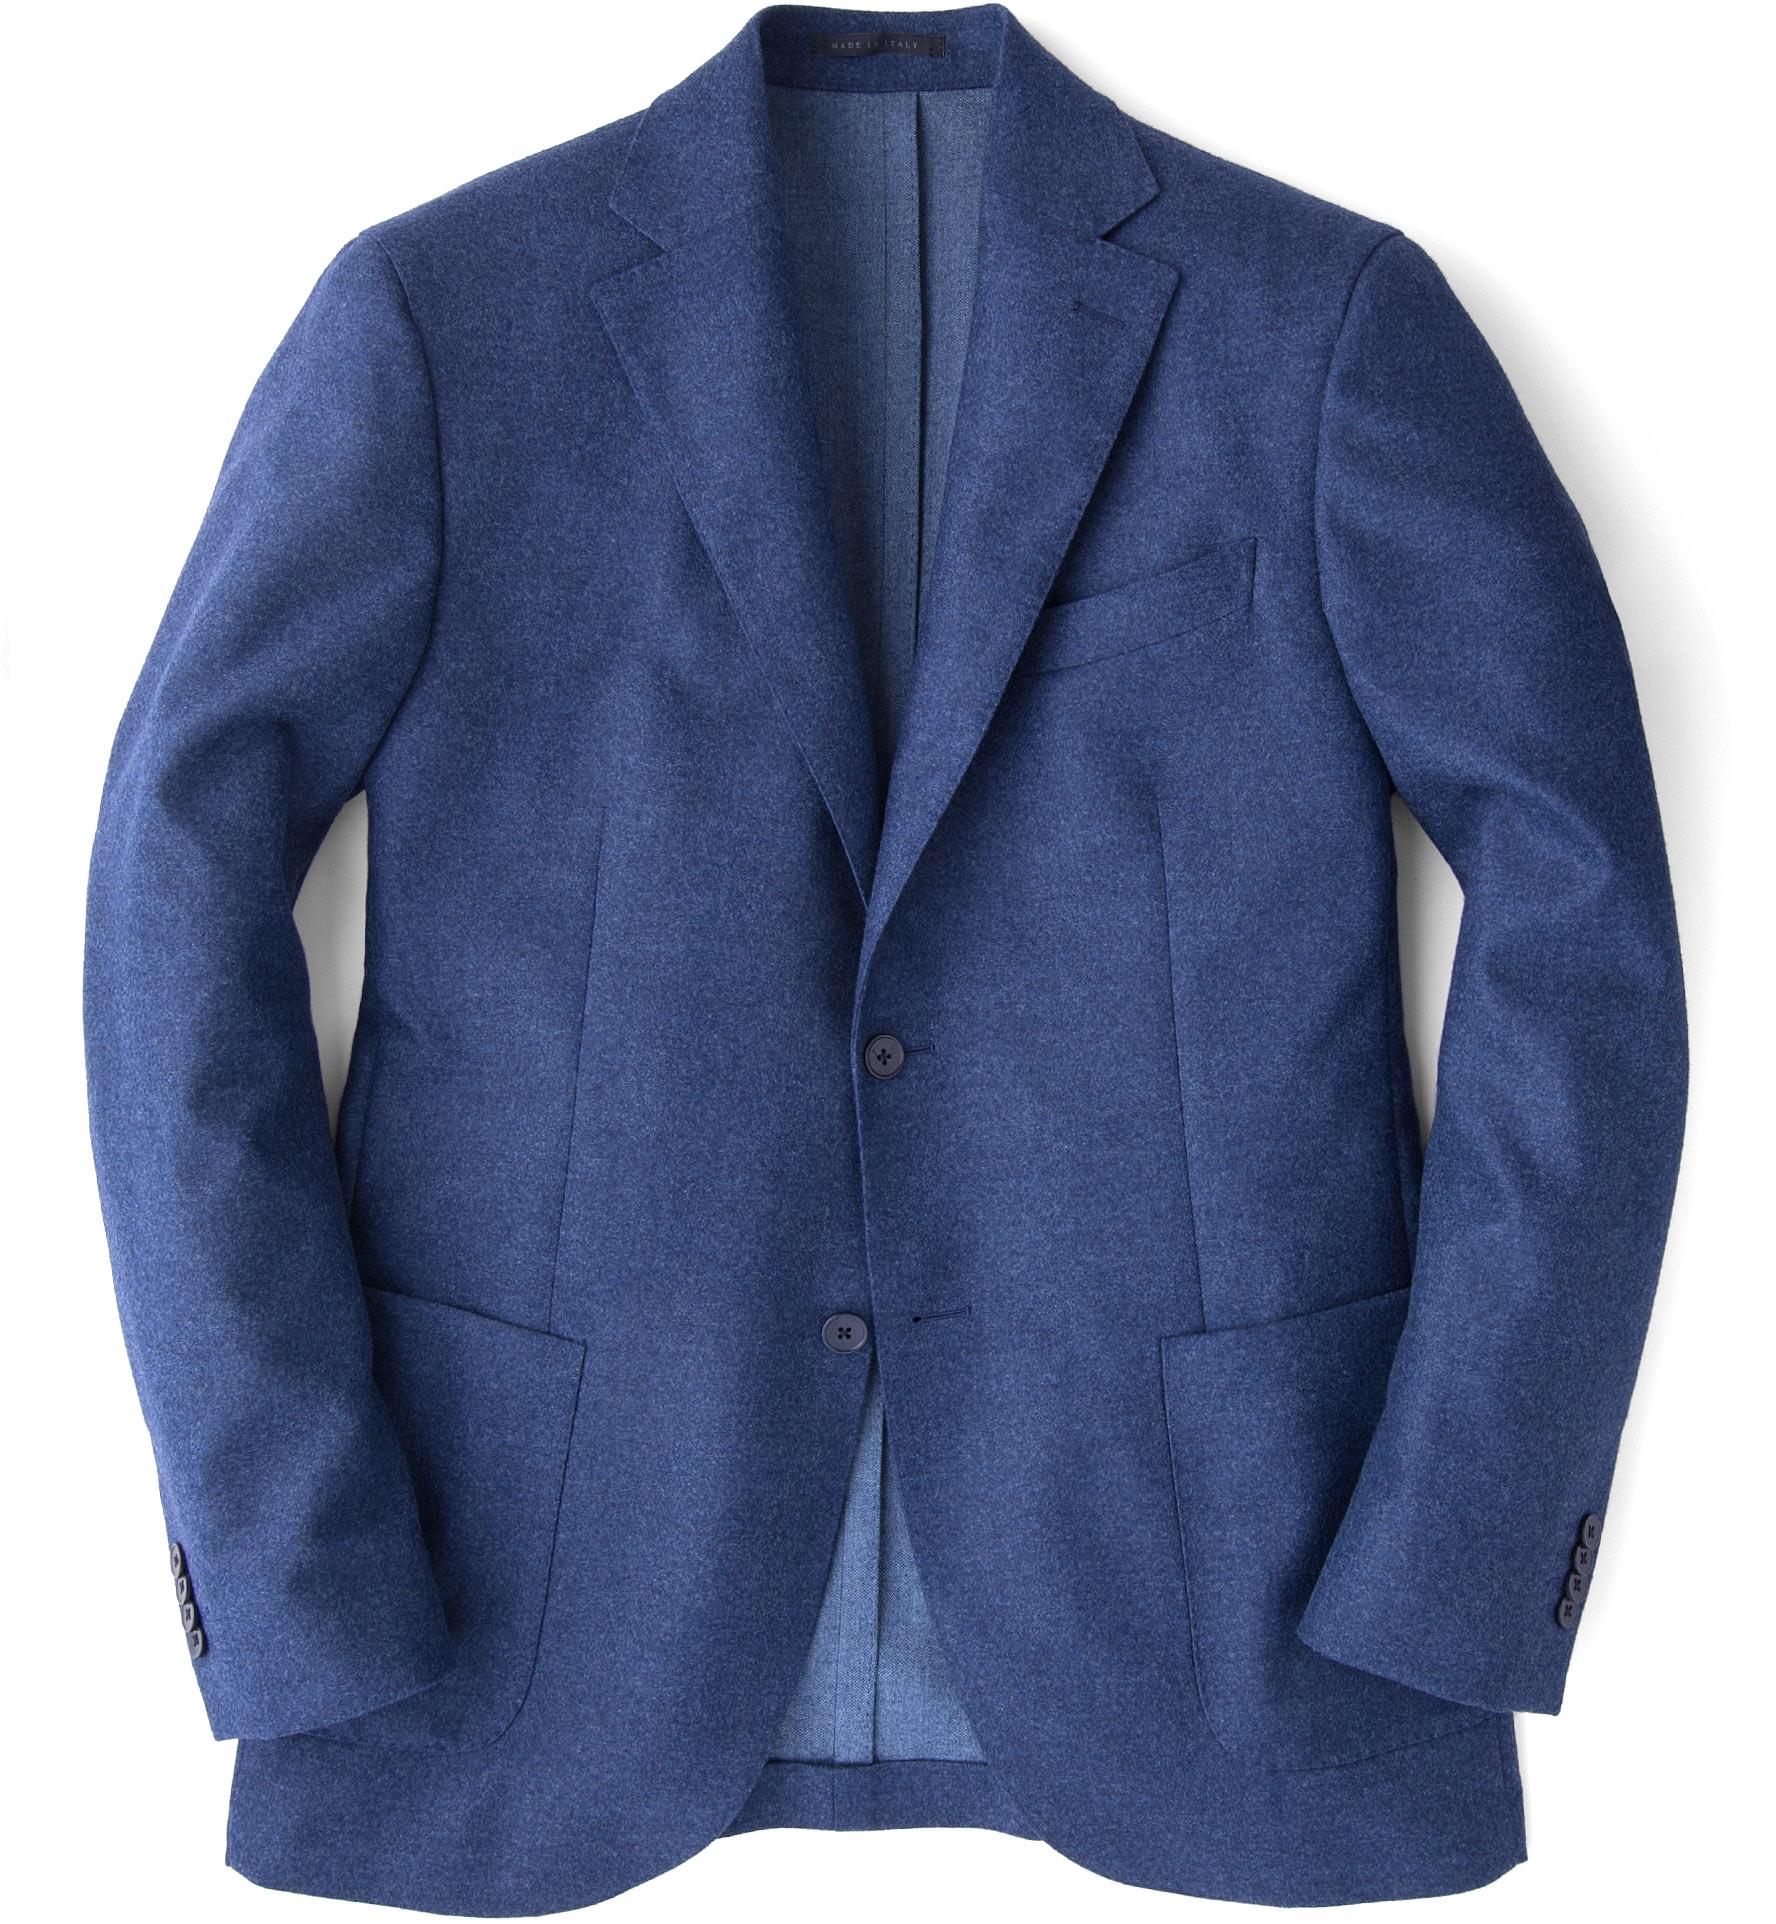 Zoom Image of Genova Melange Blue Wool Jacket